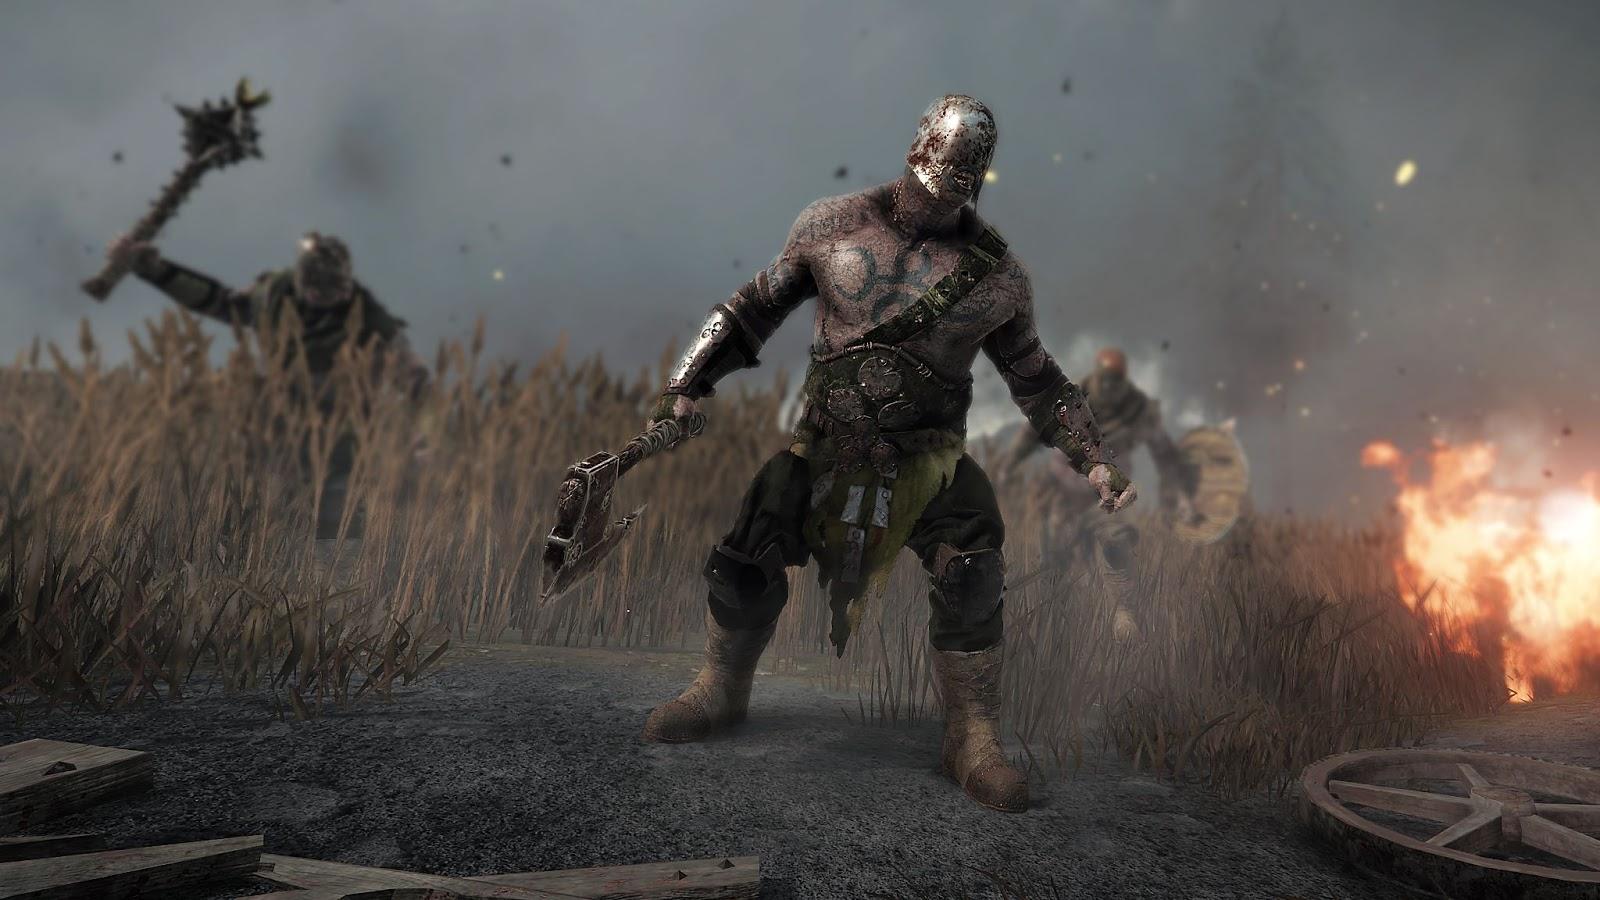 Warhammer Vermintide 2 Ranger Veteran Class (Bardin Goreksson)